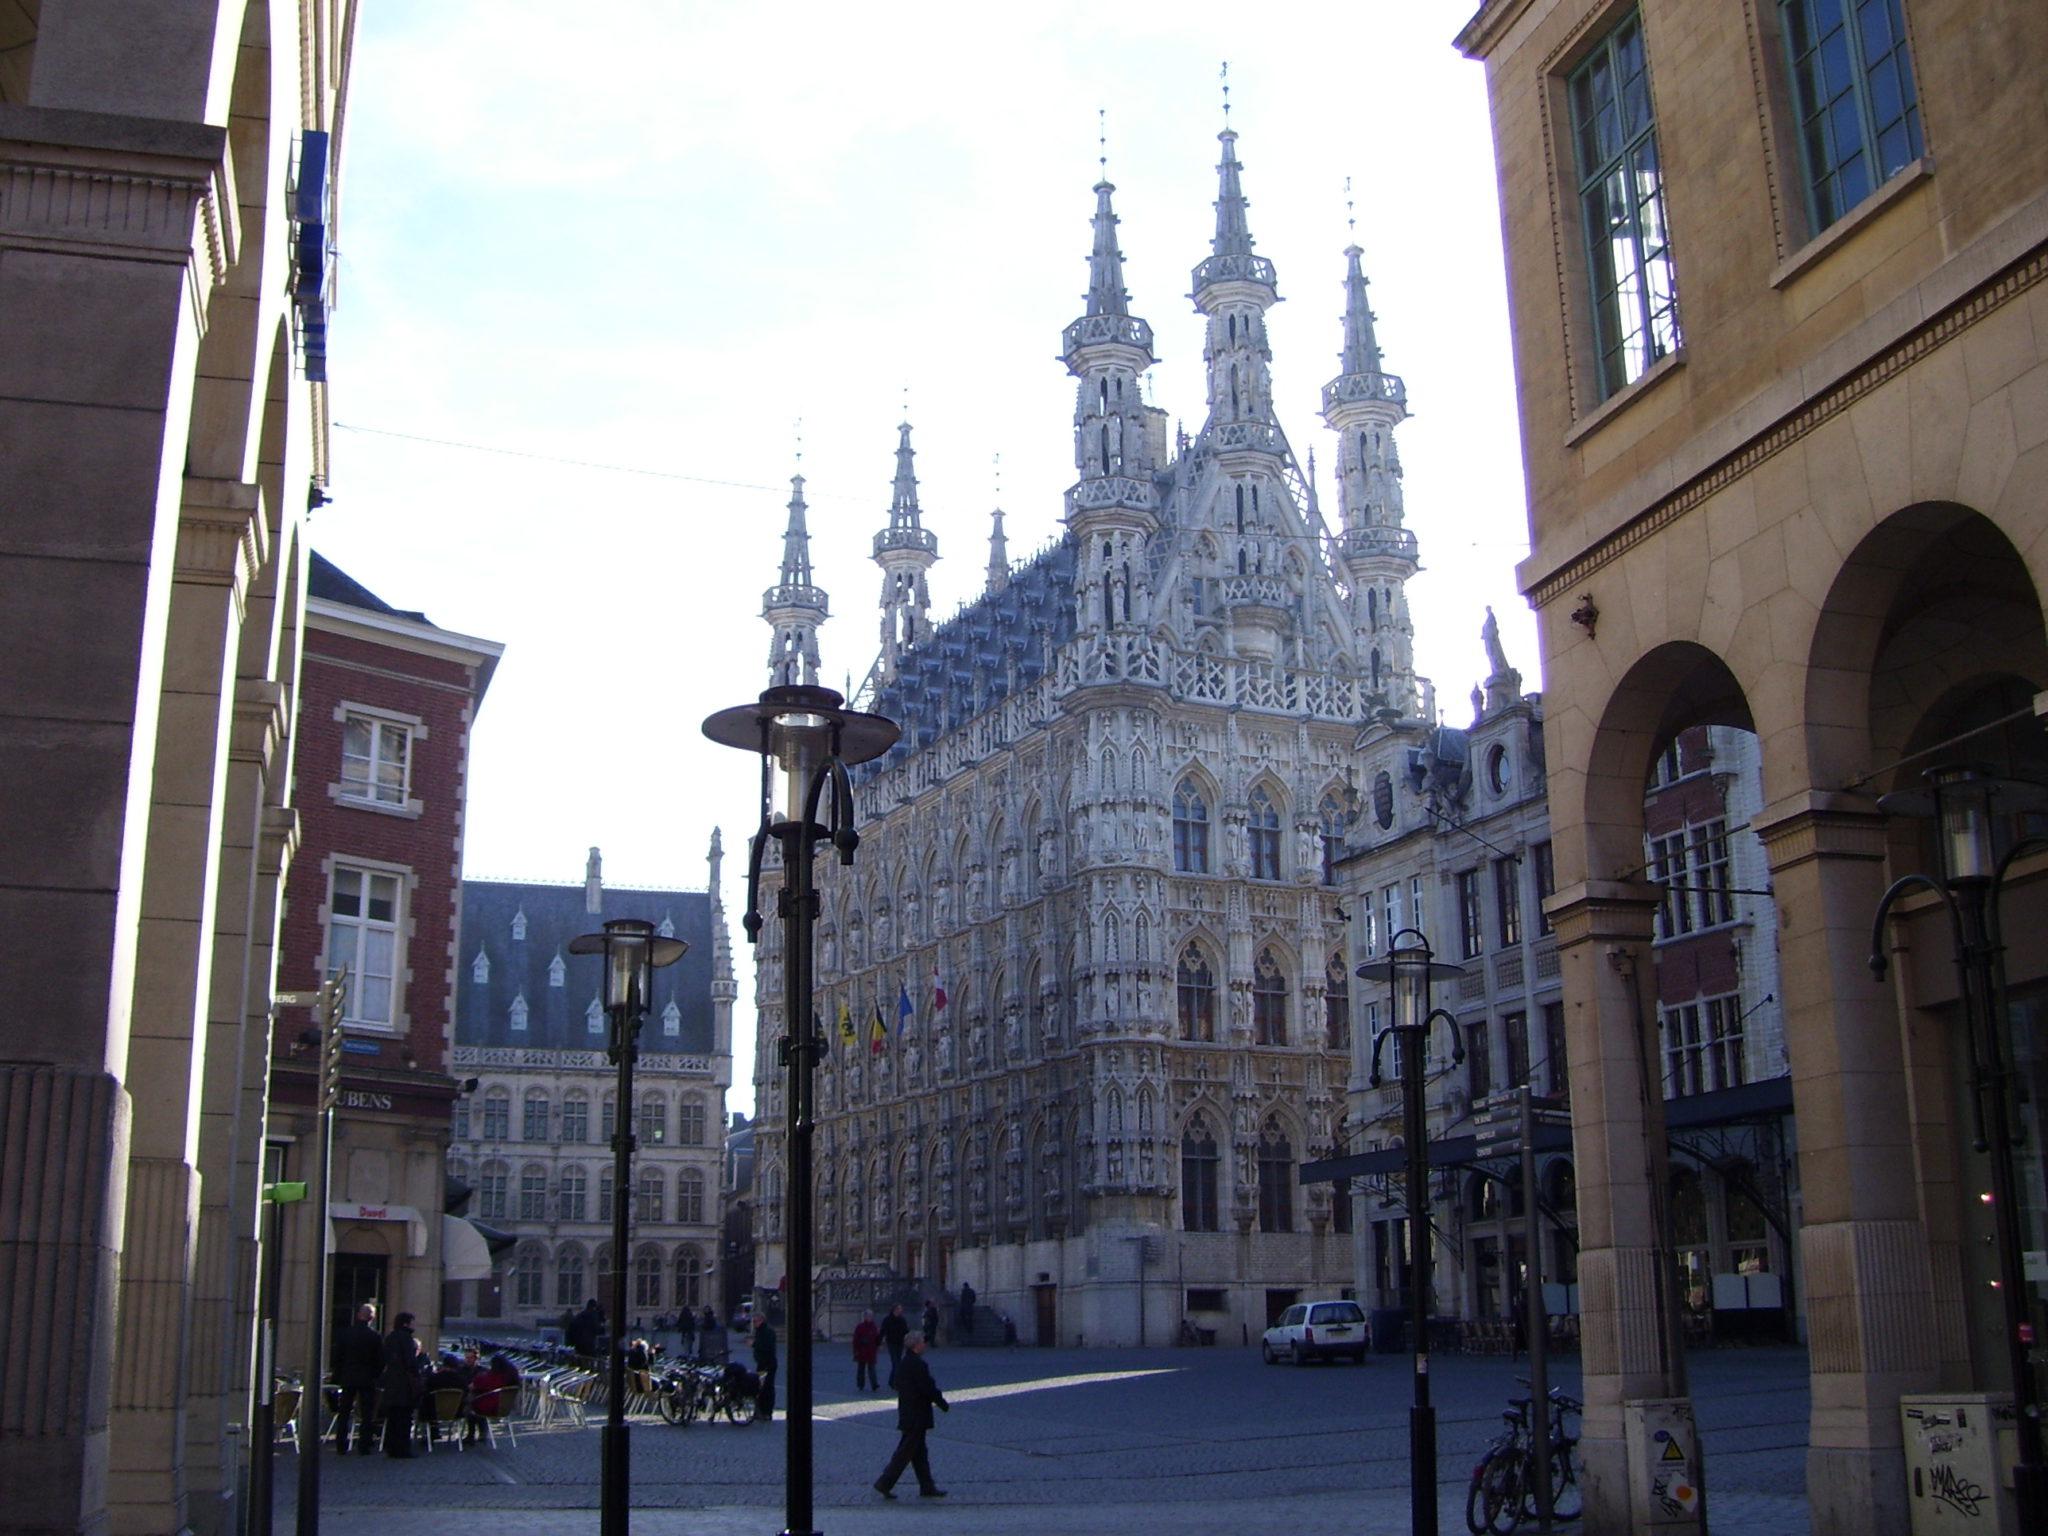 Fietsroute langs 4 abdijen in Leuven.